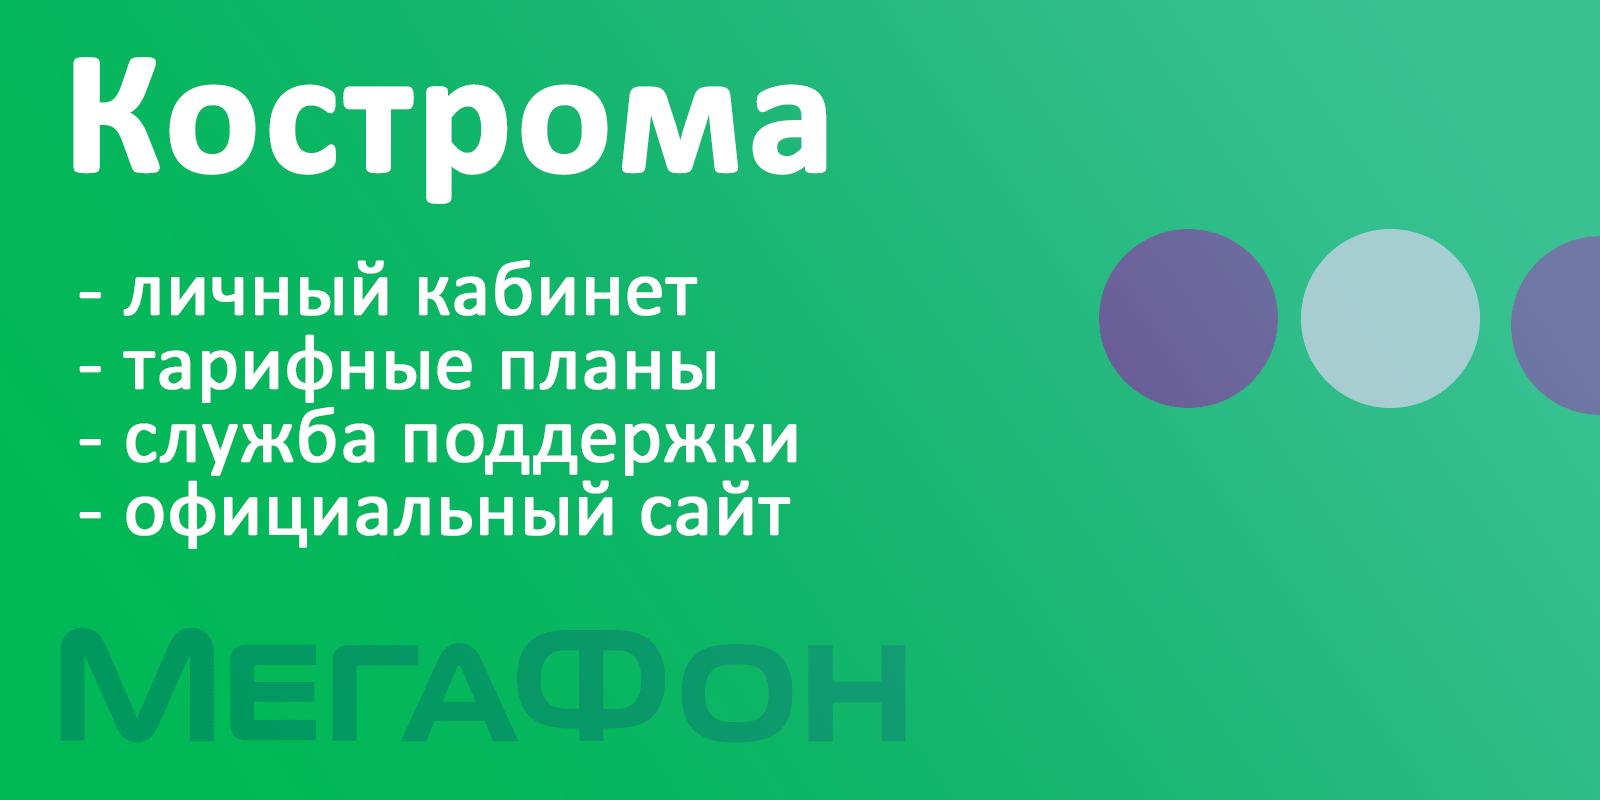 site-megafon-kostroma.png